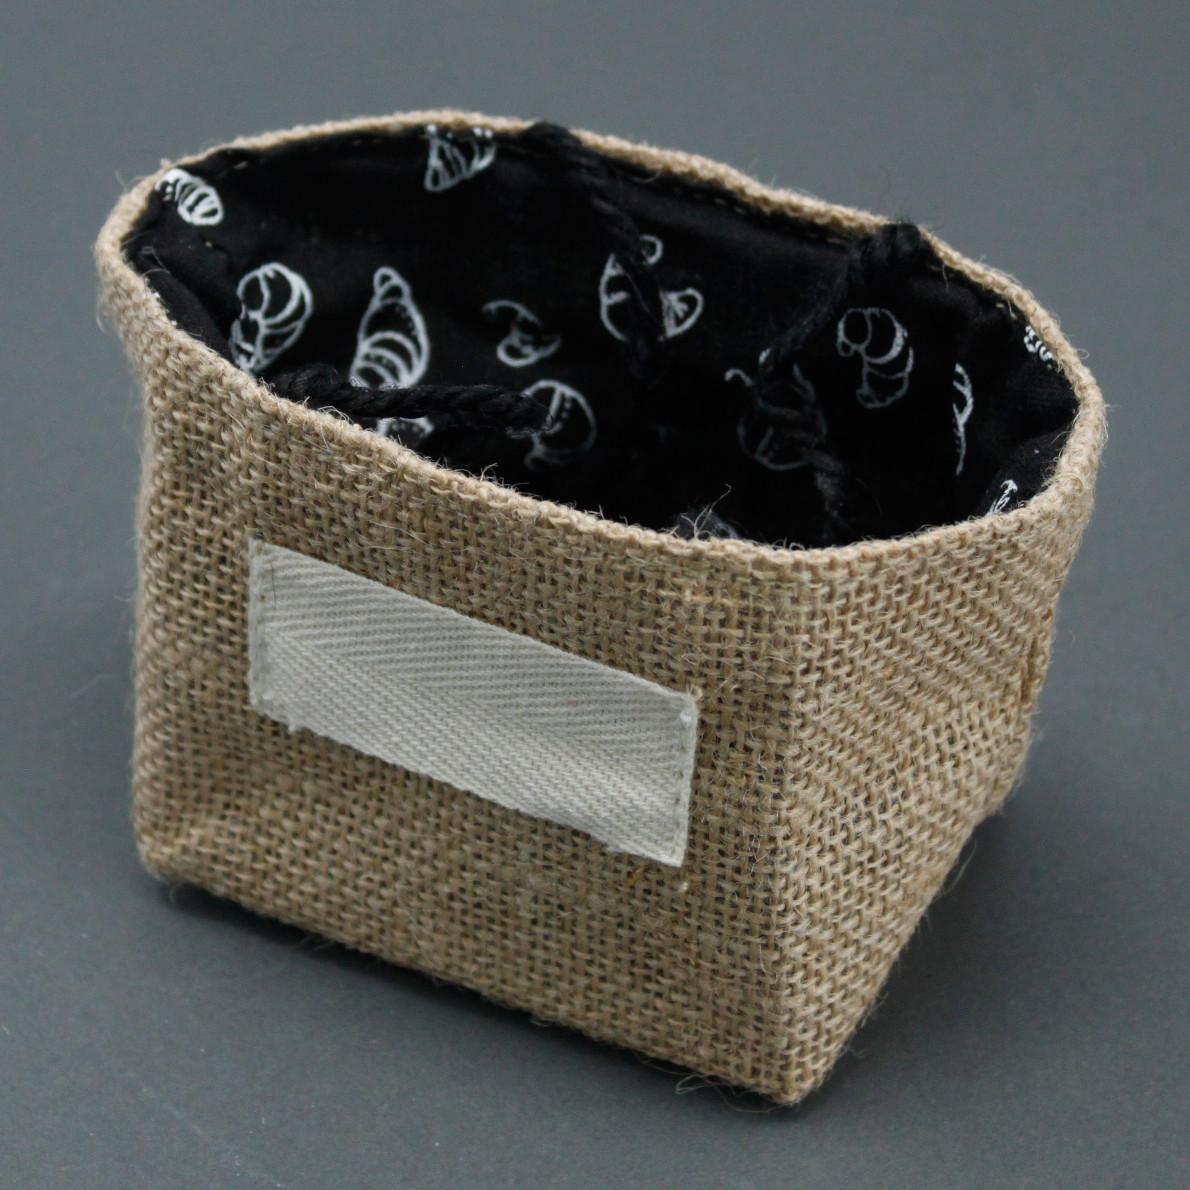 Natural Jute Cotton Gift Bag Black Lining Small